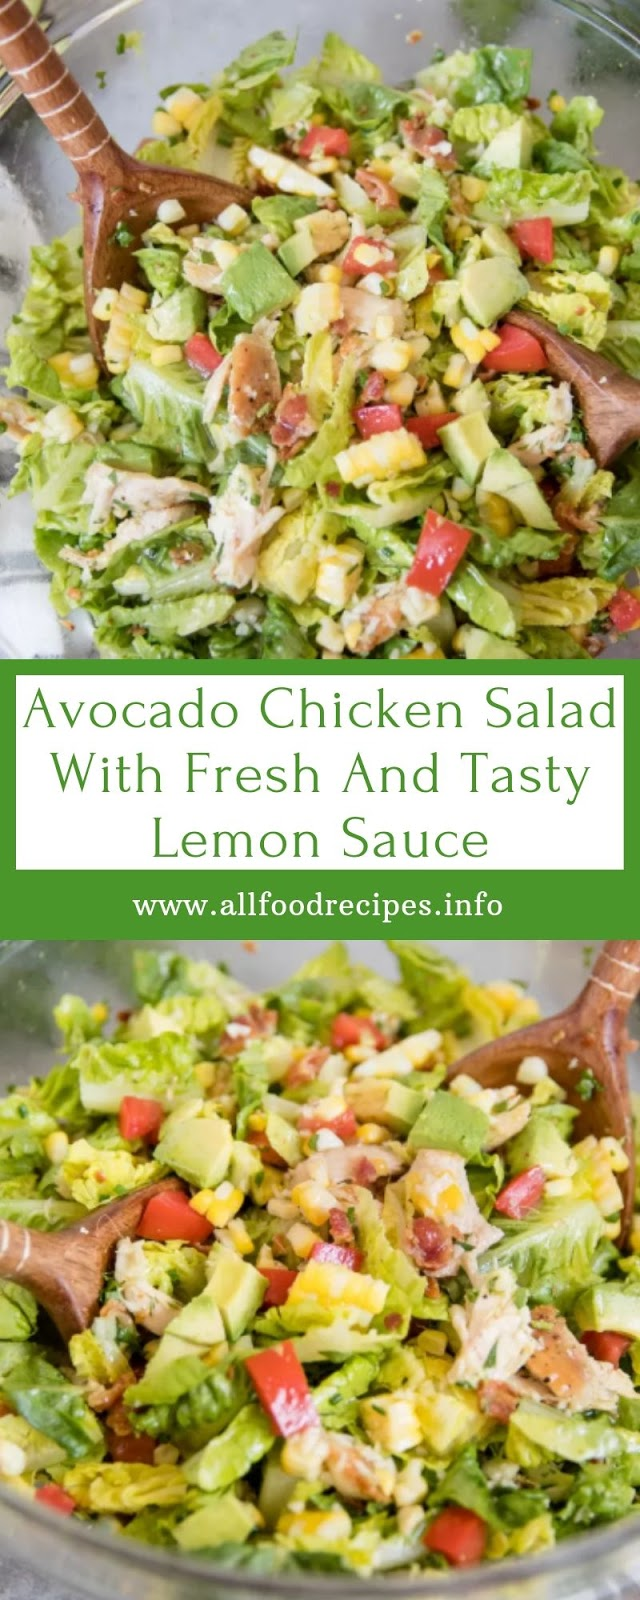 Avocado Chicken Salad With Fresh And Tasty Lemon Sauce